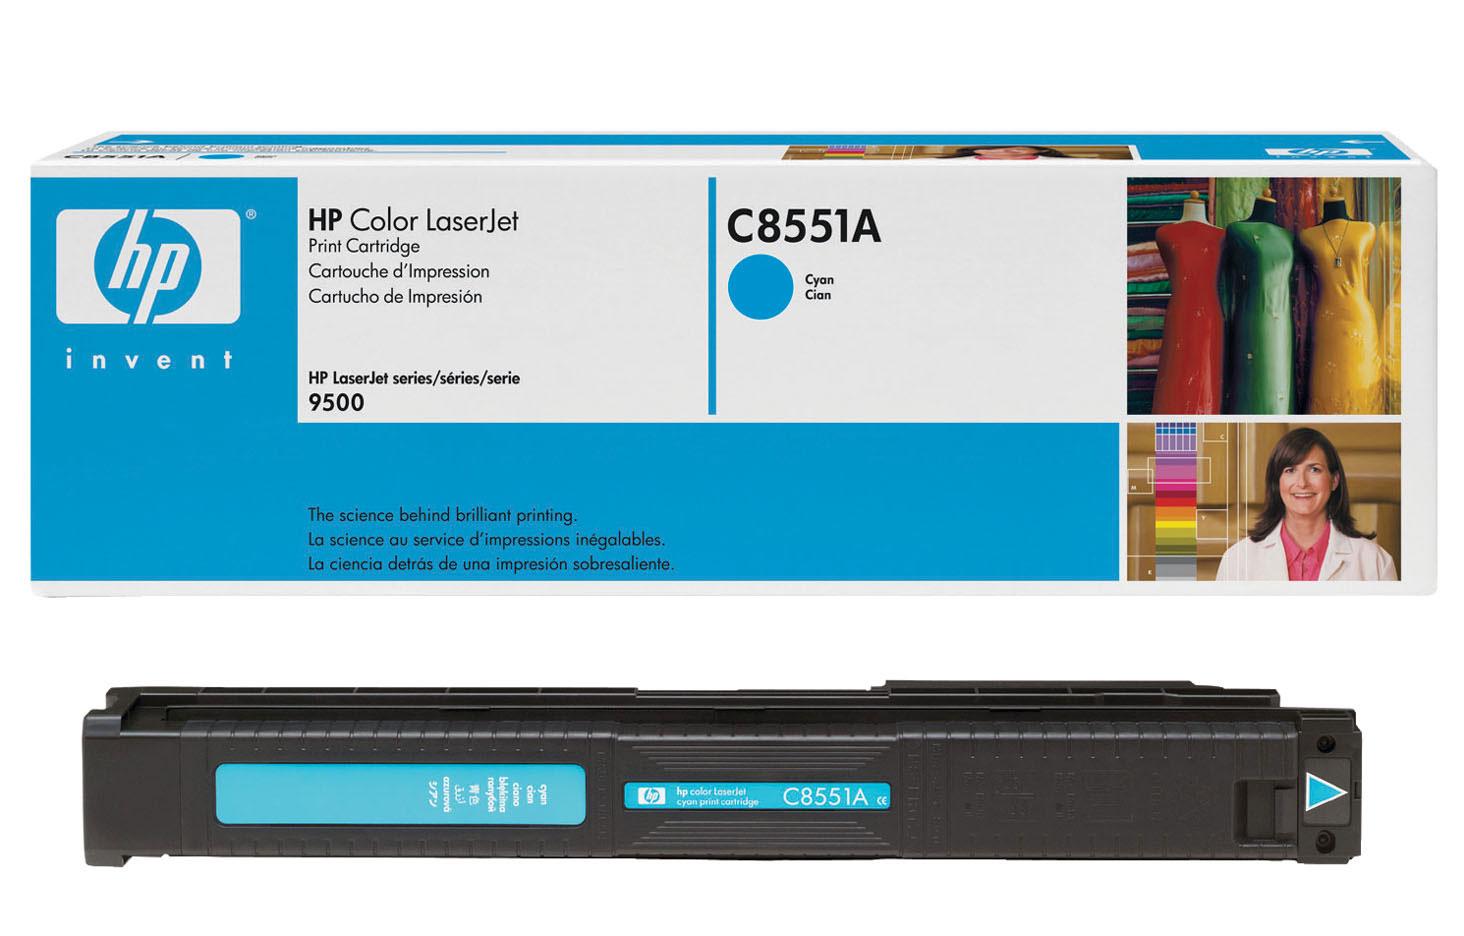 Toner Cartridge Brother Ink Dell Cartridges Hp 81 680 Ml Black Designjet Dye Original C8551a Cyan